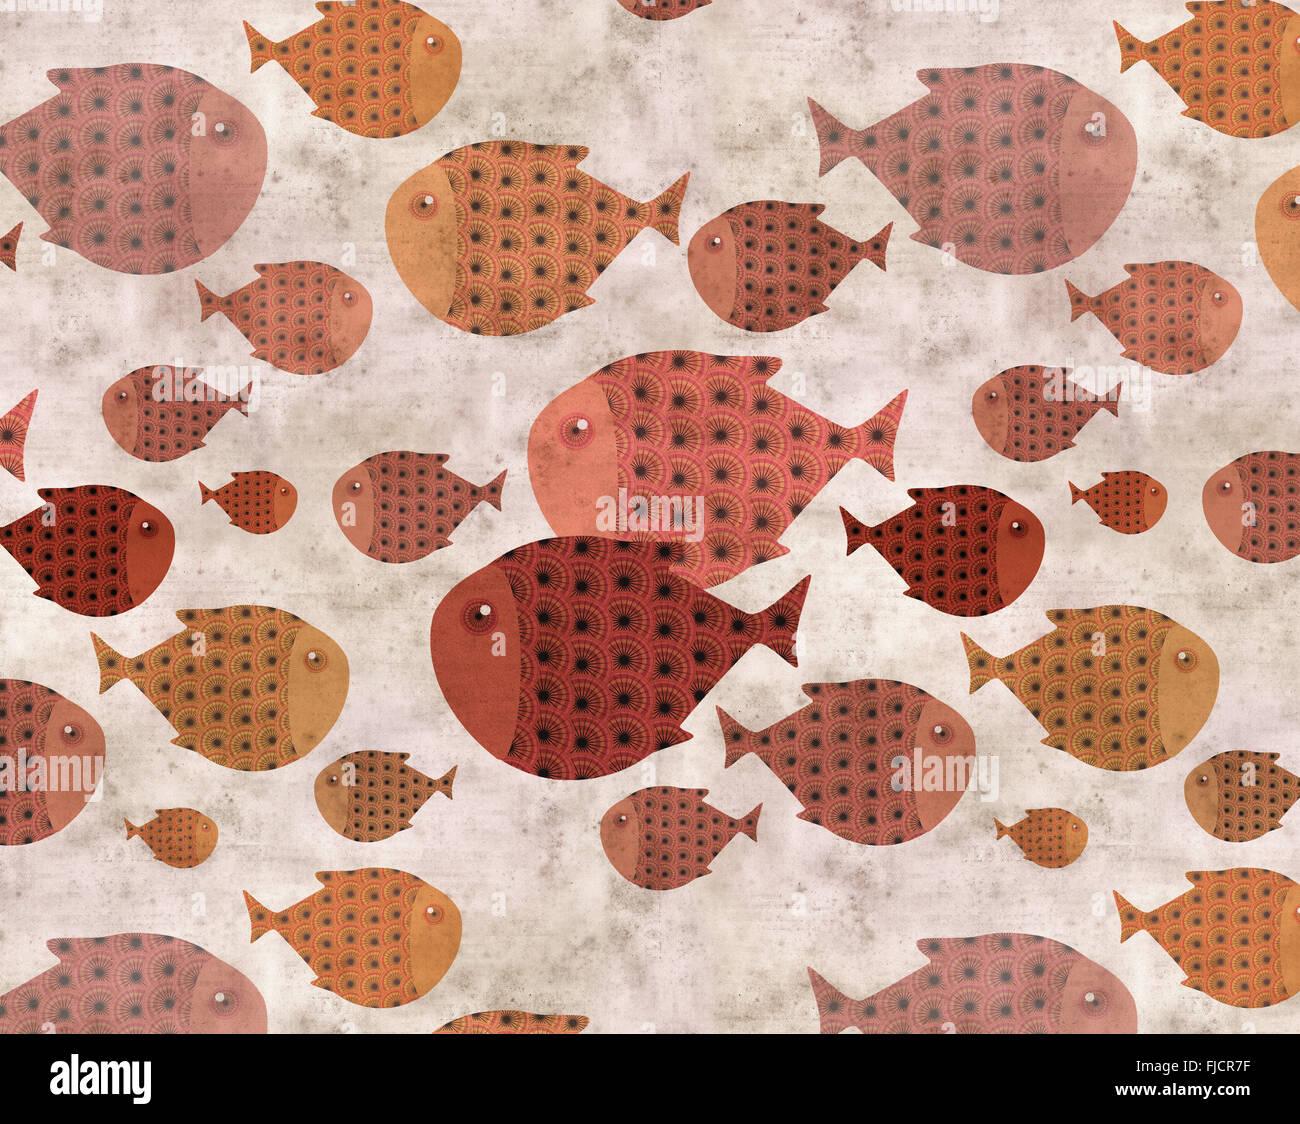 Ilustración de pescado antecedentes étnicos Imagen De Stock